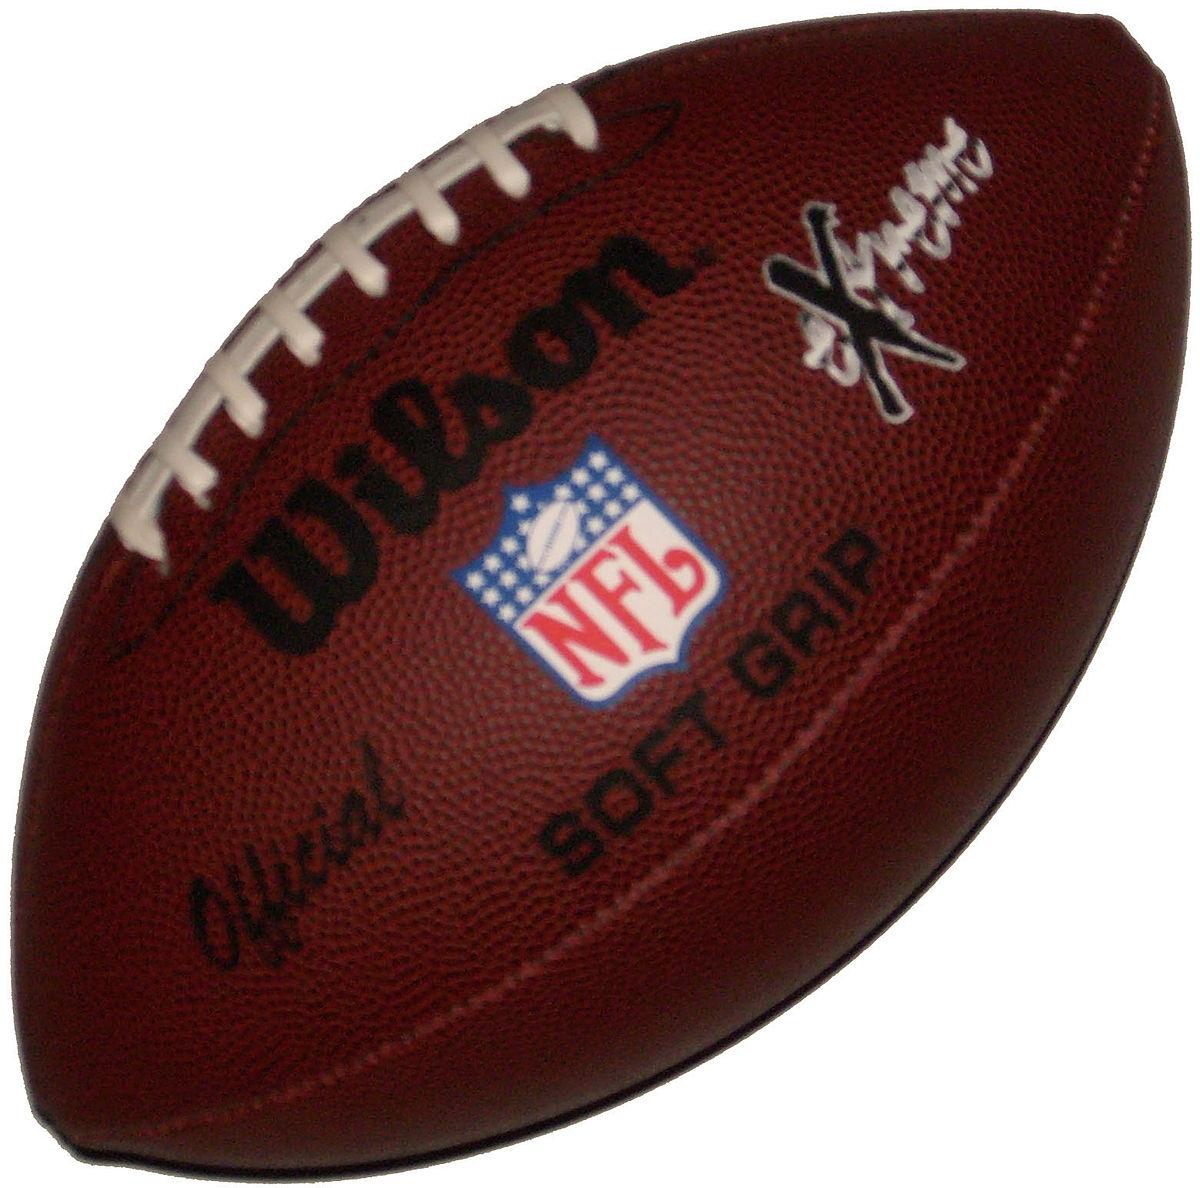 Wilson Sporting Goods - Wikipedia d699262a1db7e